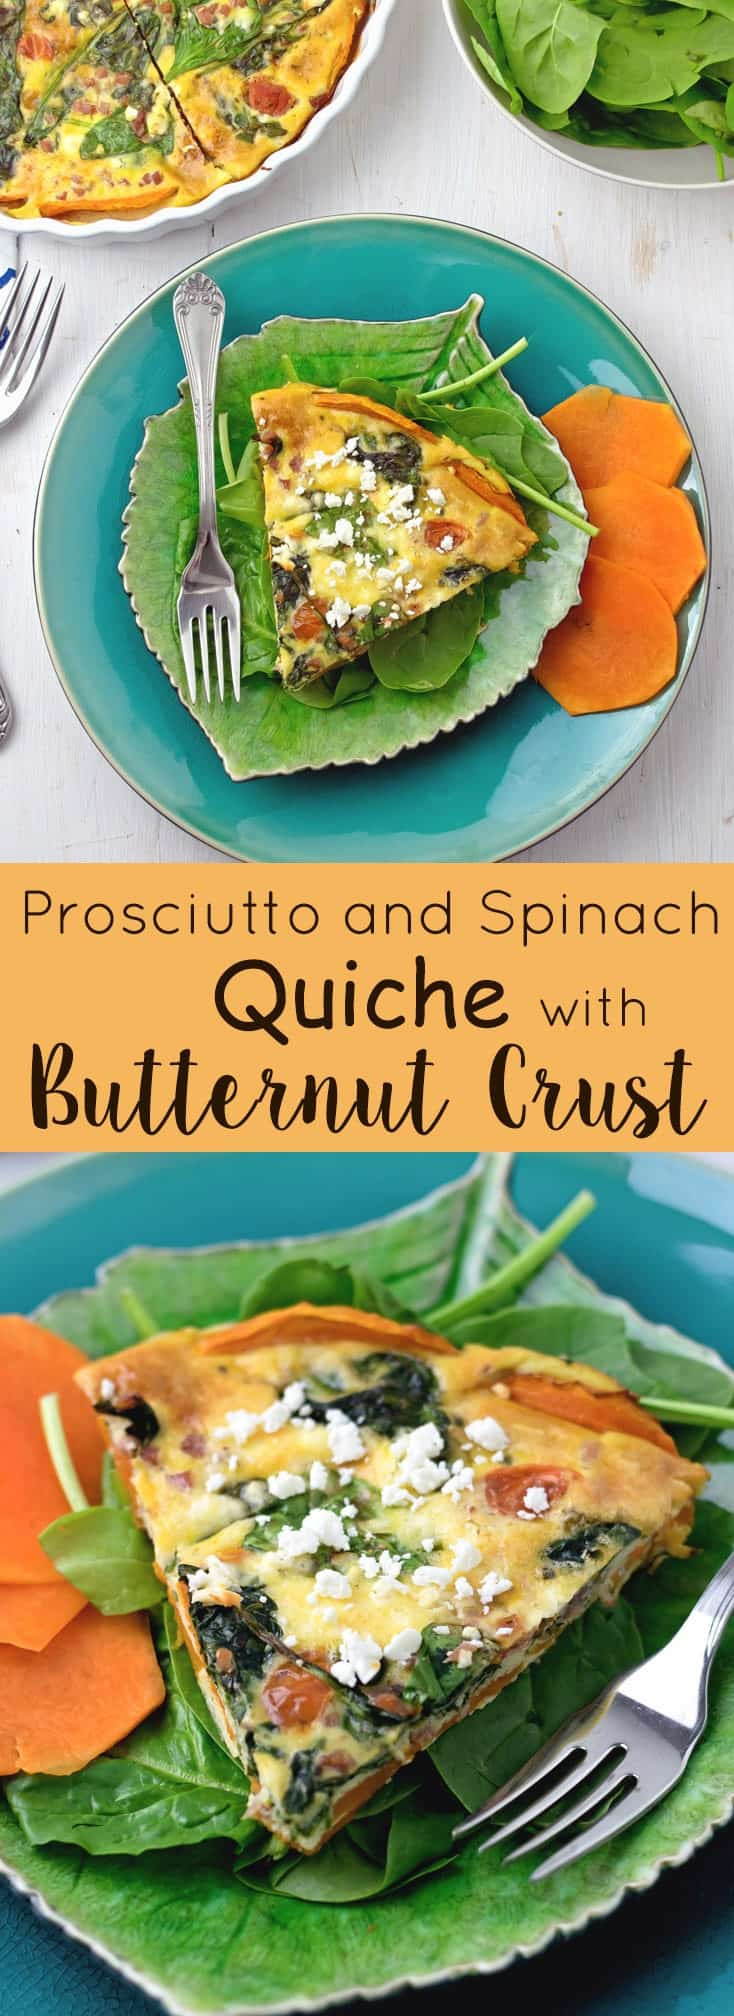 Prosciutto-Spinach-Quiche-Butternut-Crust